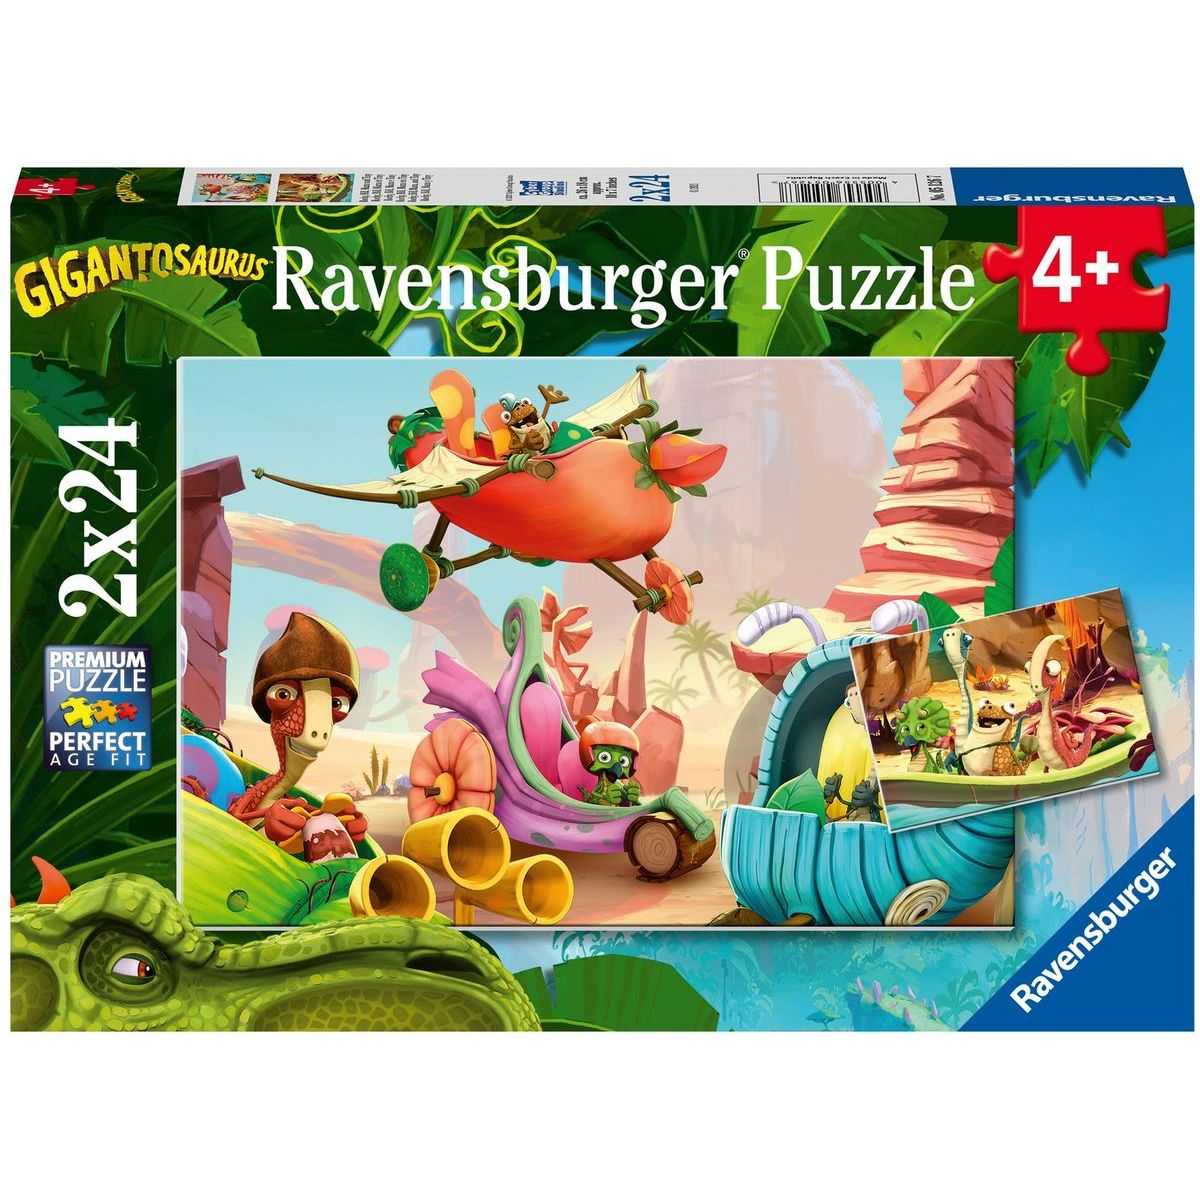 Ravensburger puzzle 051267 Gigantosaurus 2x24 dielikov